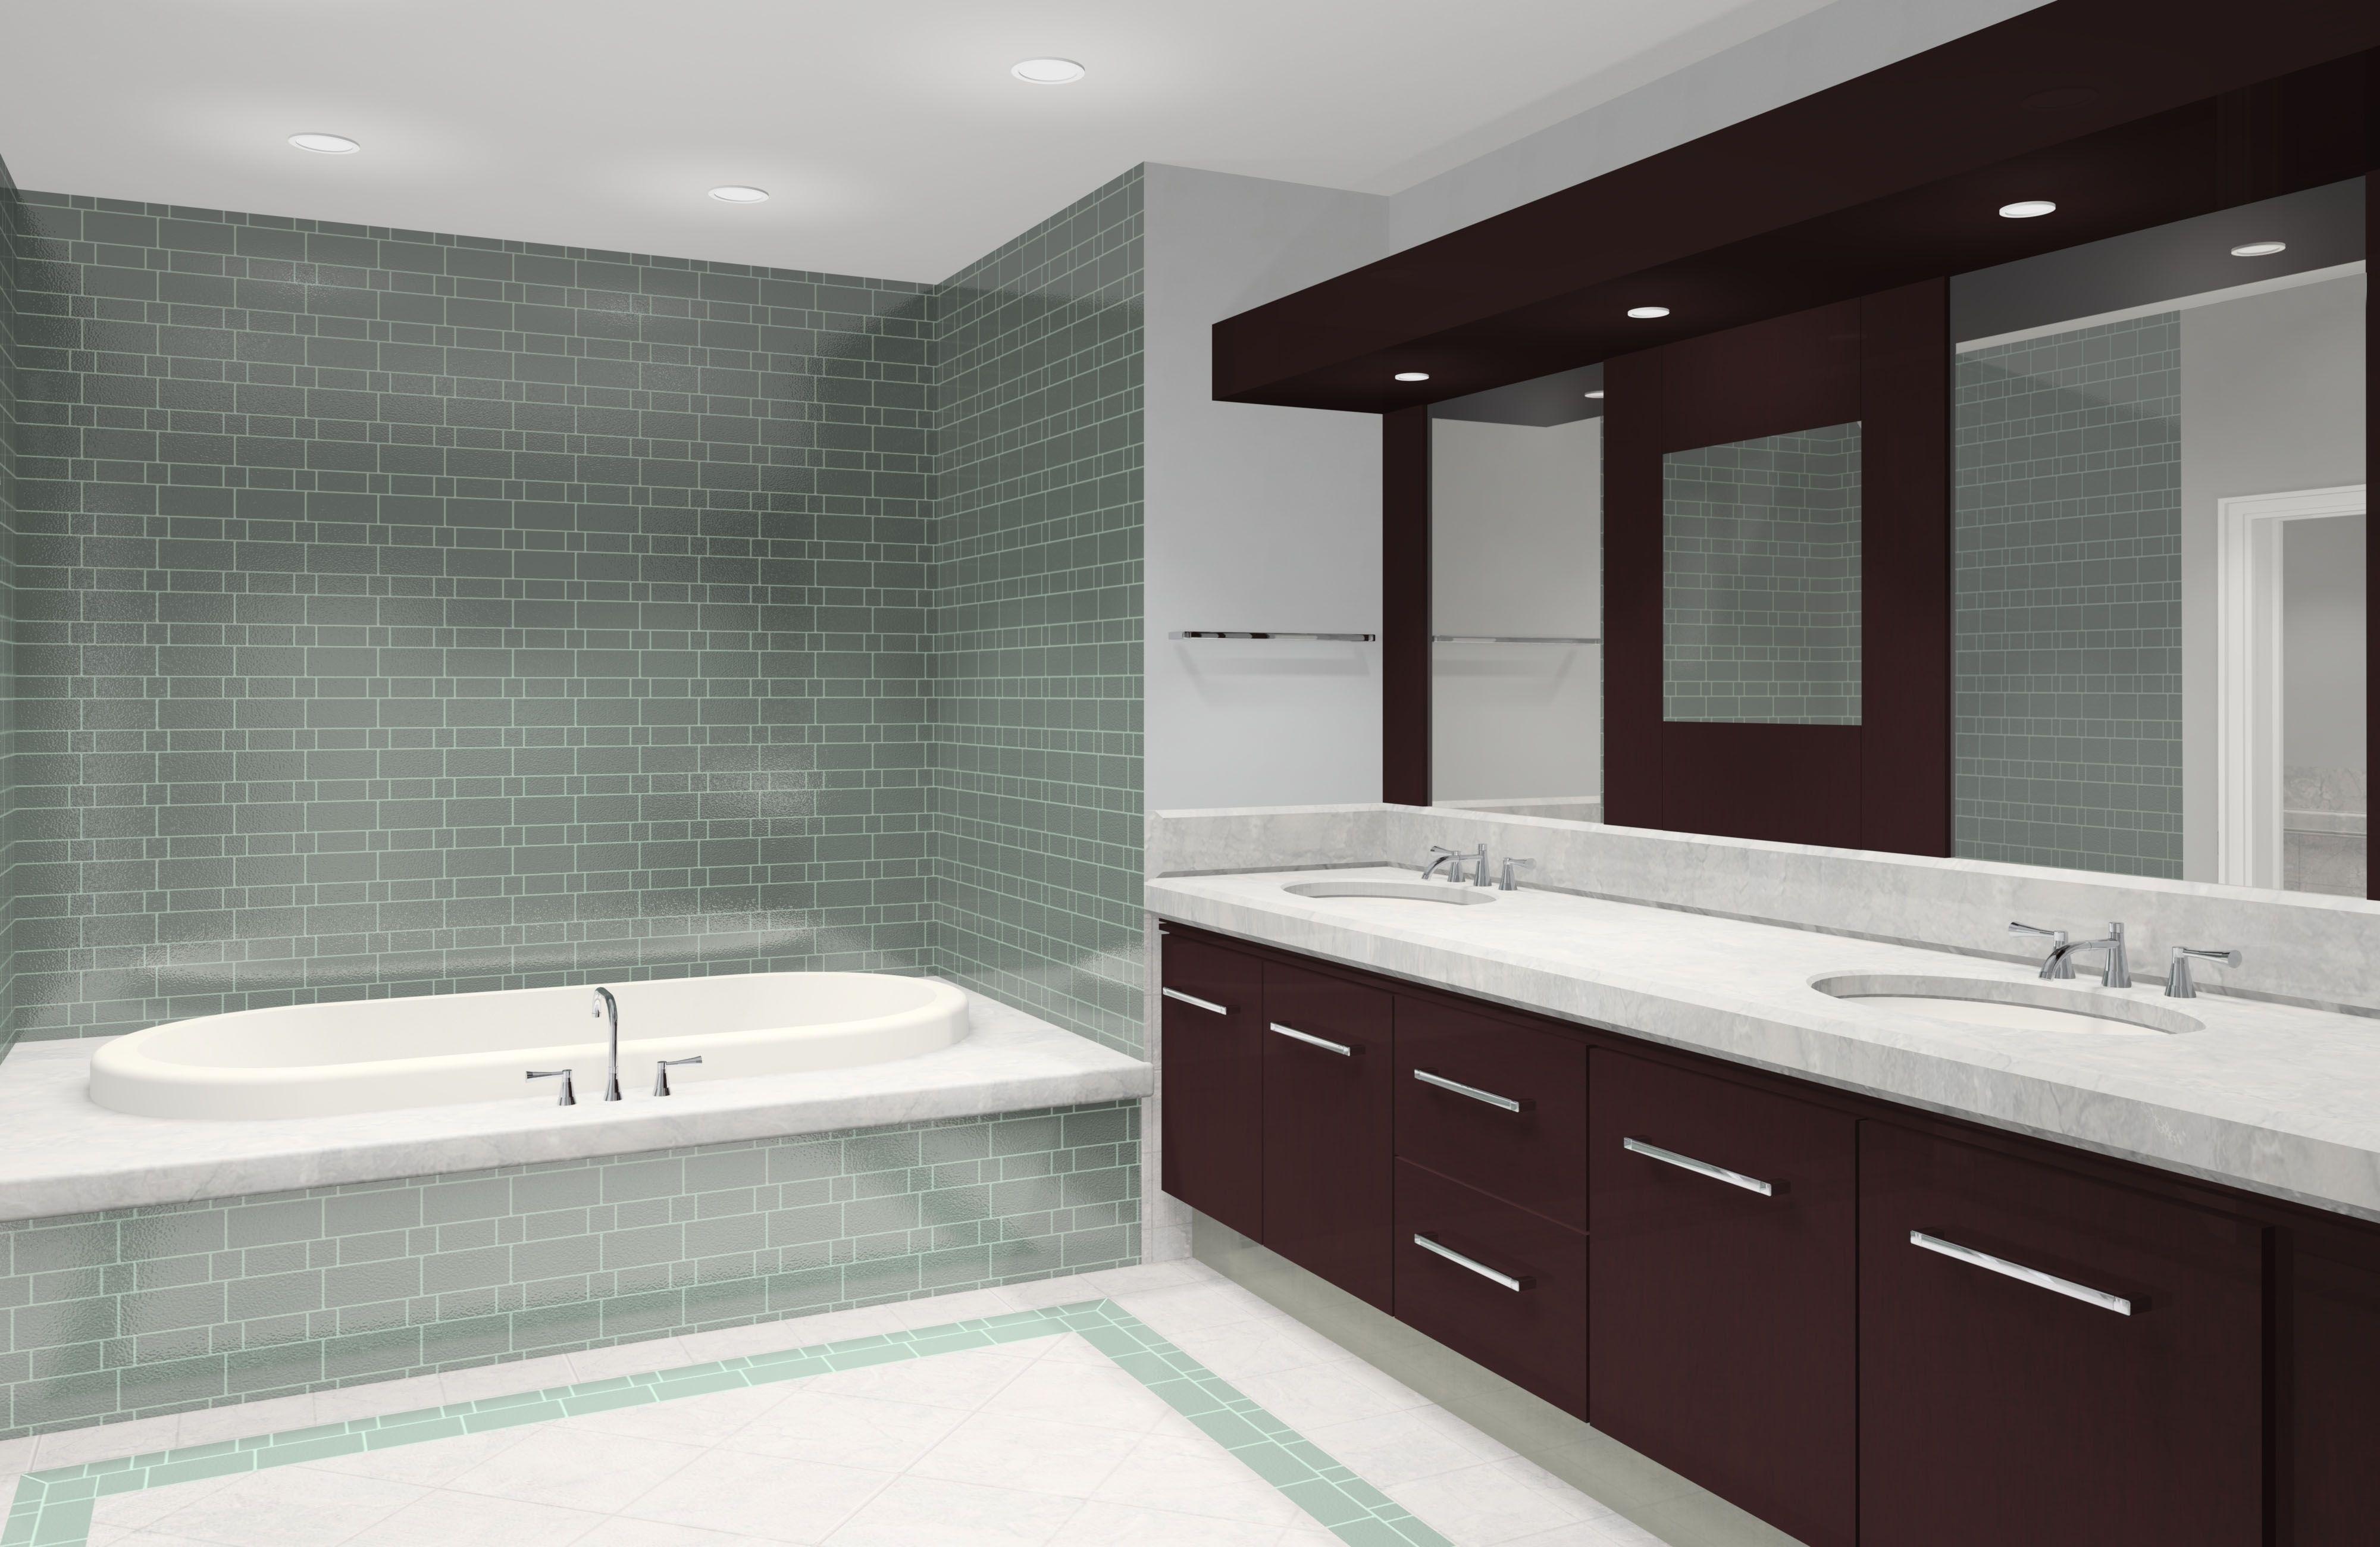 12 Houzz Modern Bathrooms Most Of The Exquisite And Interesting Simple Bathroom Modern Bathroom Elegant Bathroom